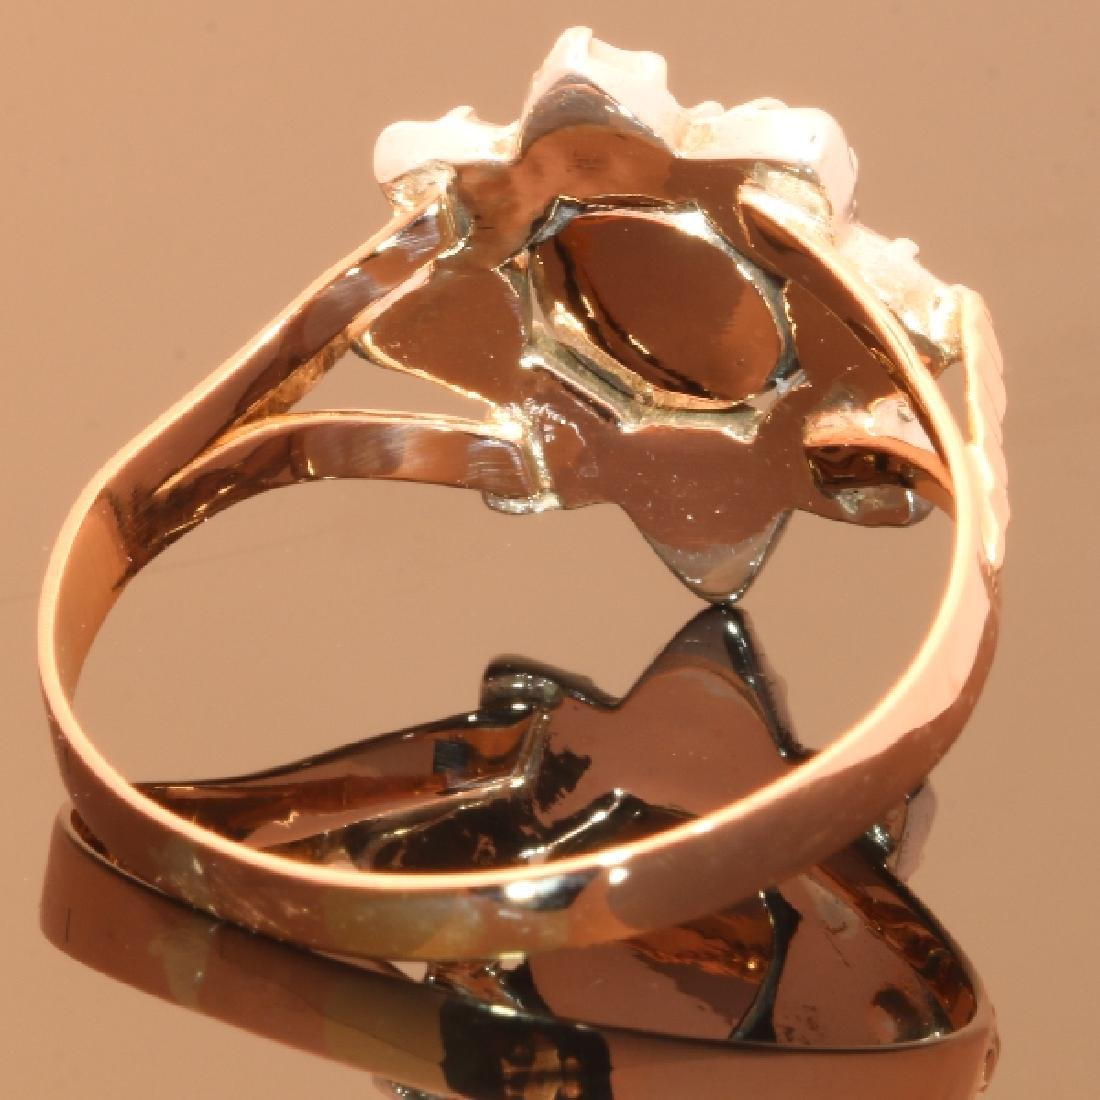 Antique 18K Gold Rose Cut Diamond Ring, c1780 - 2